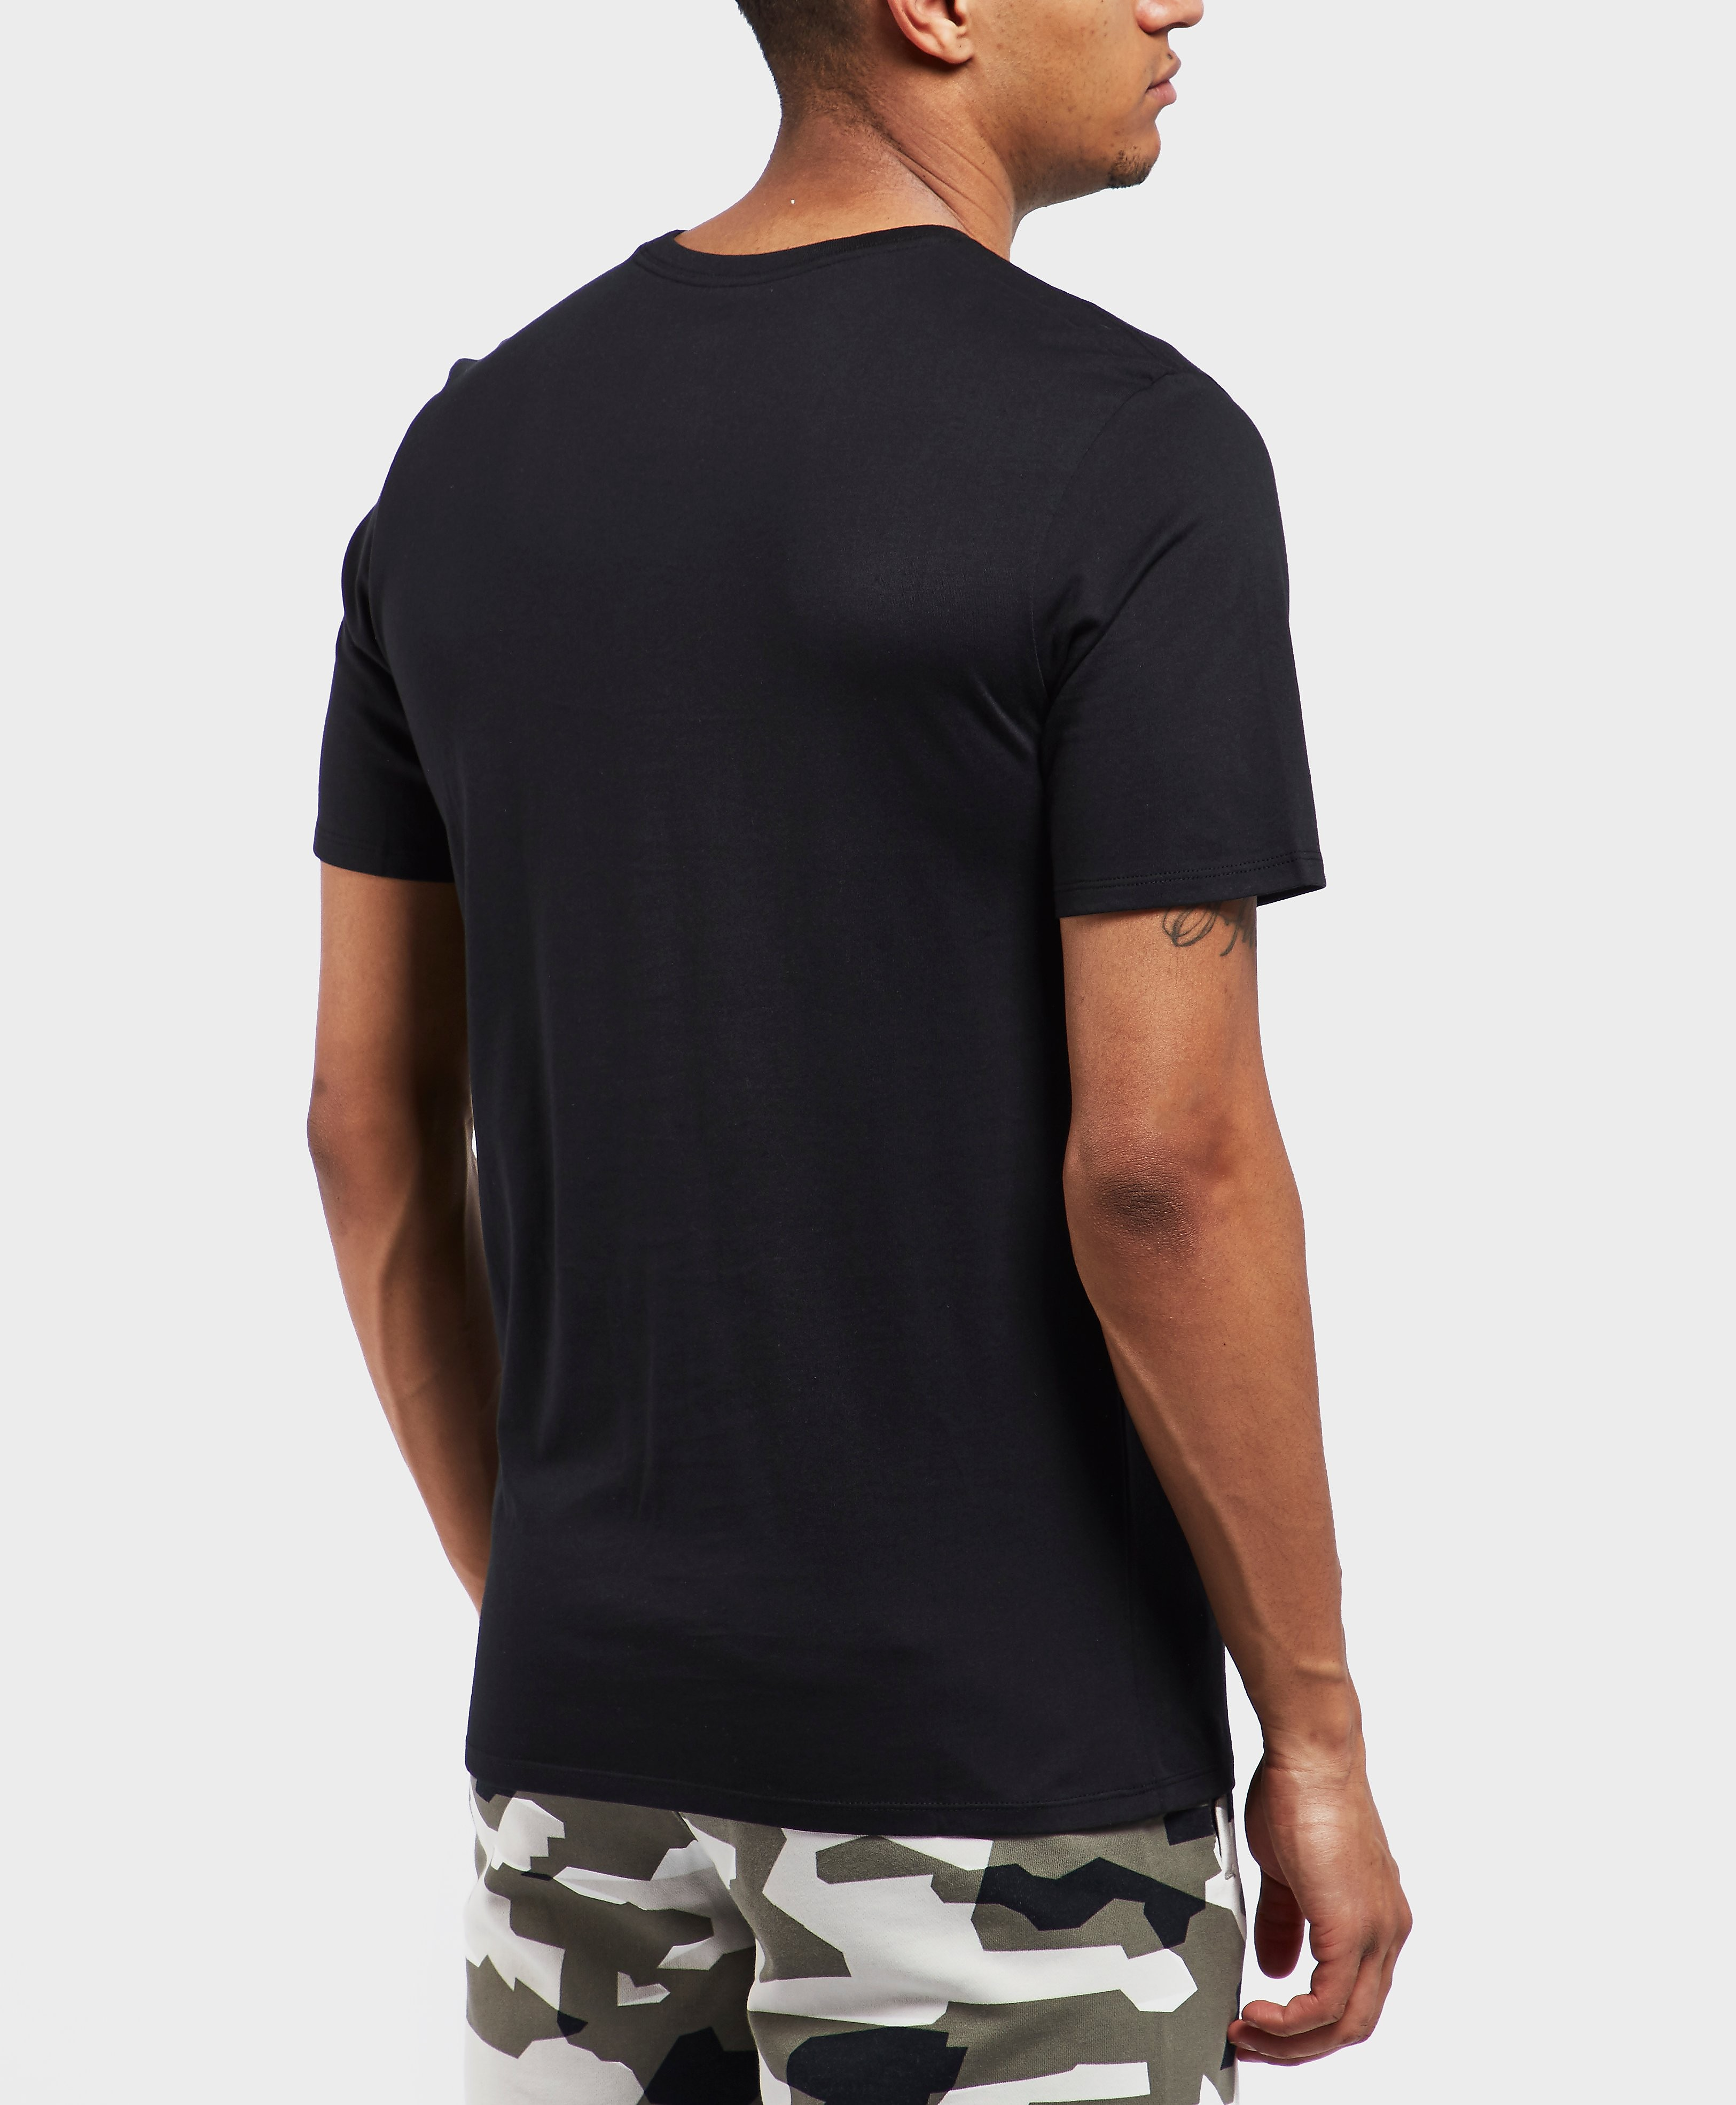 Nike Camo Logo Short Sleeve T-Shirt